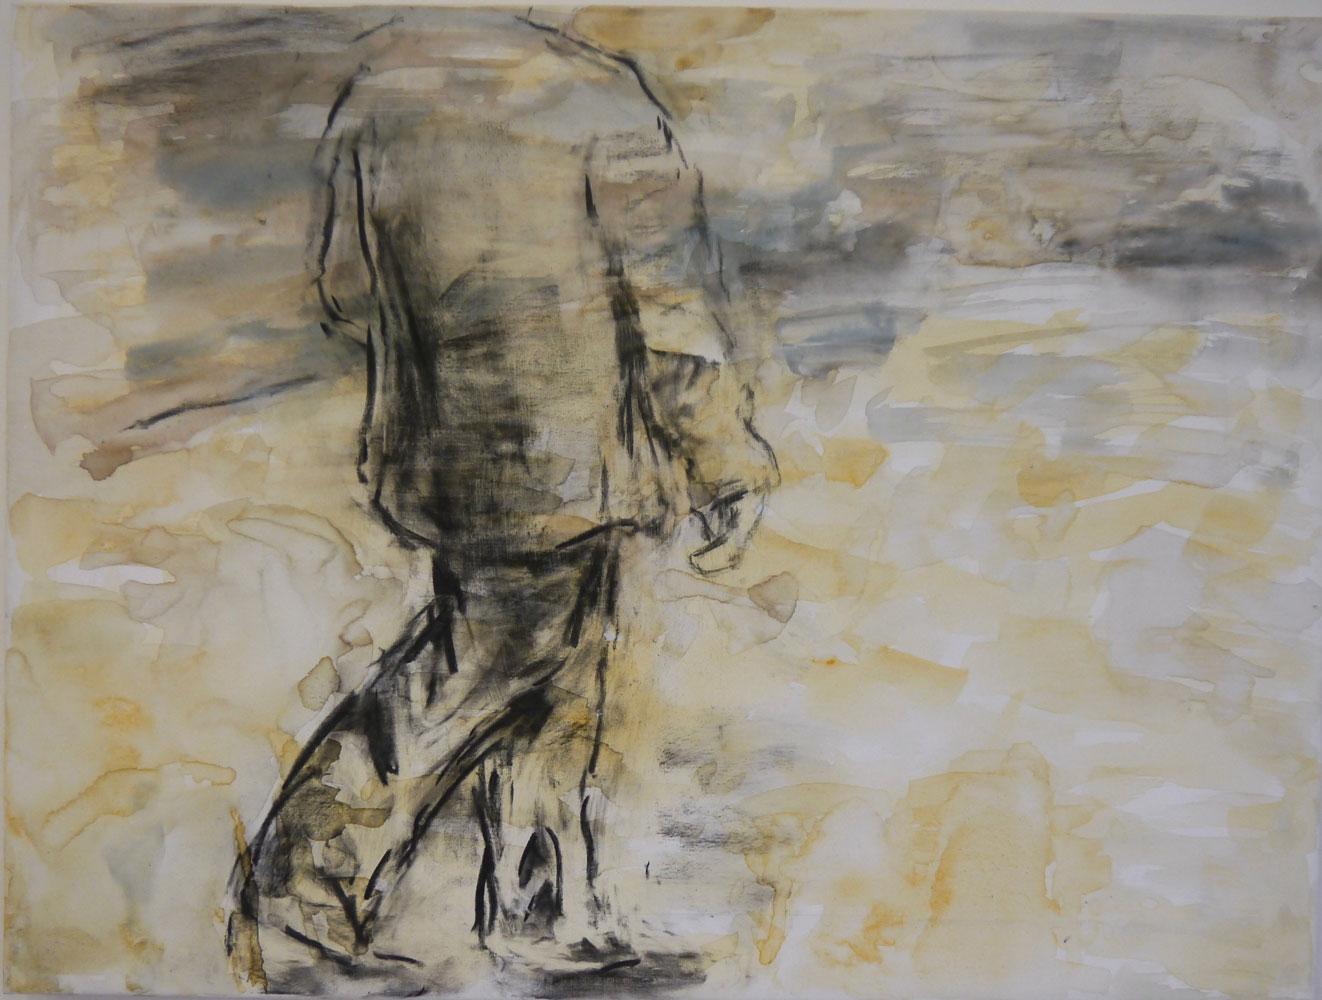 Wanderer, 2015, mixed media on canvas, 80 x 60 cm